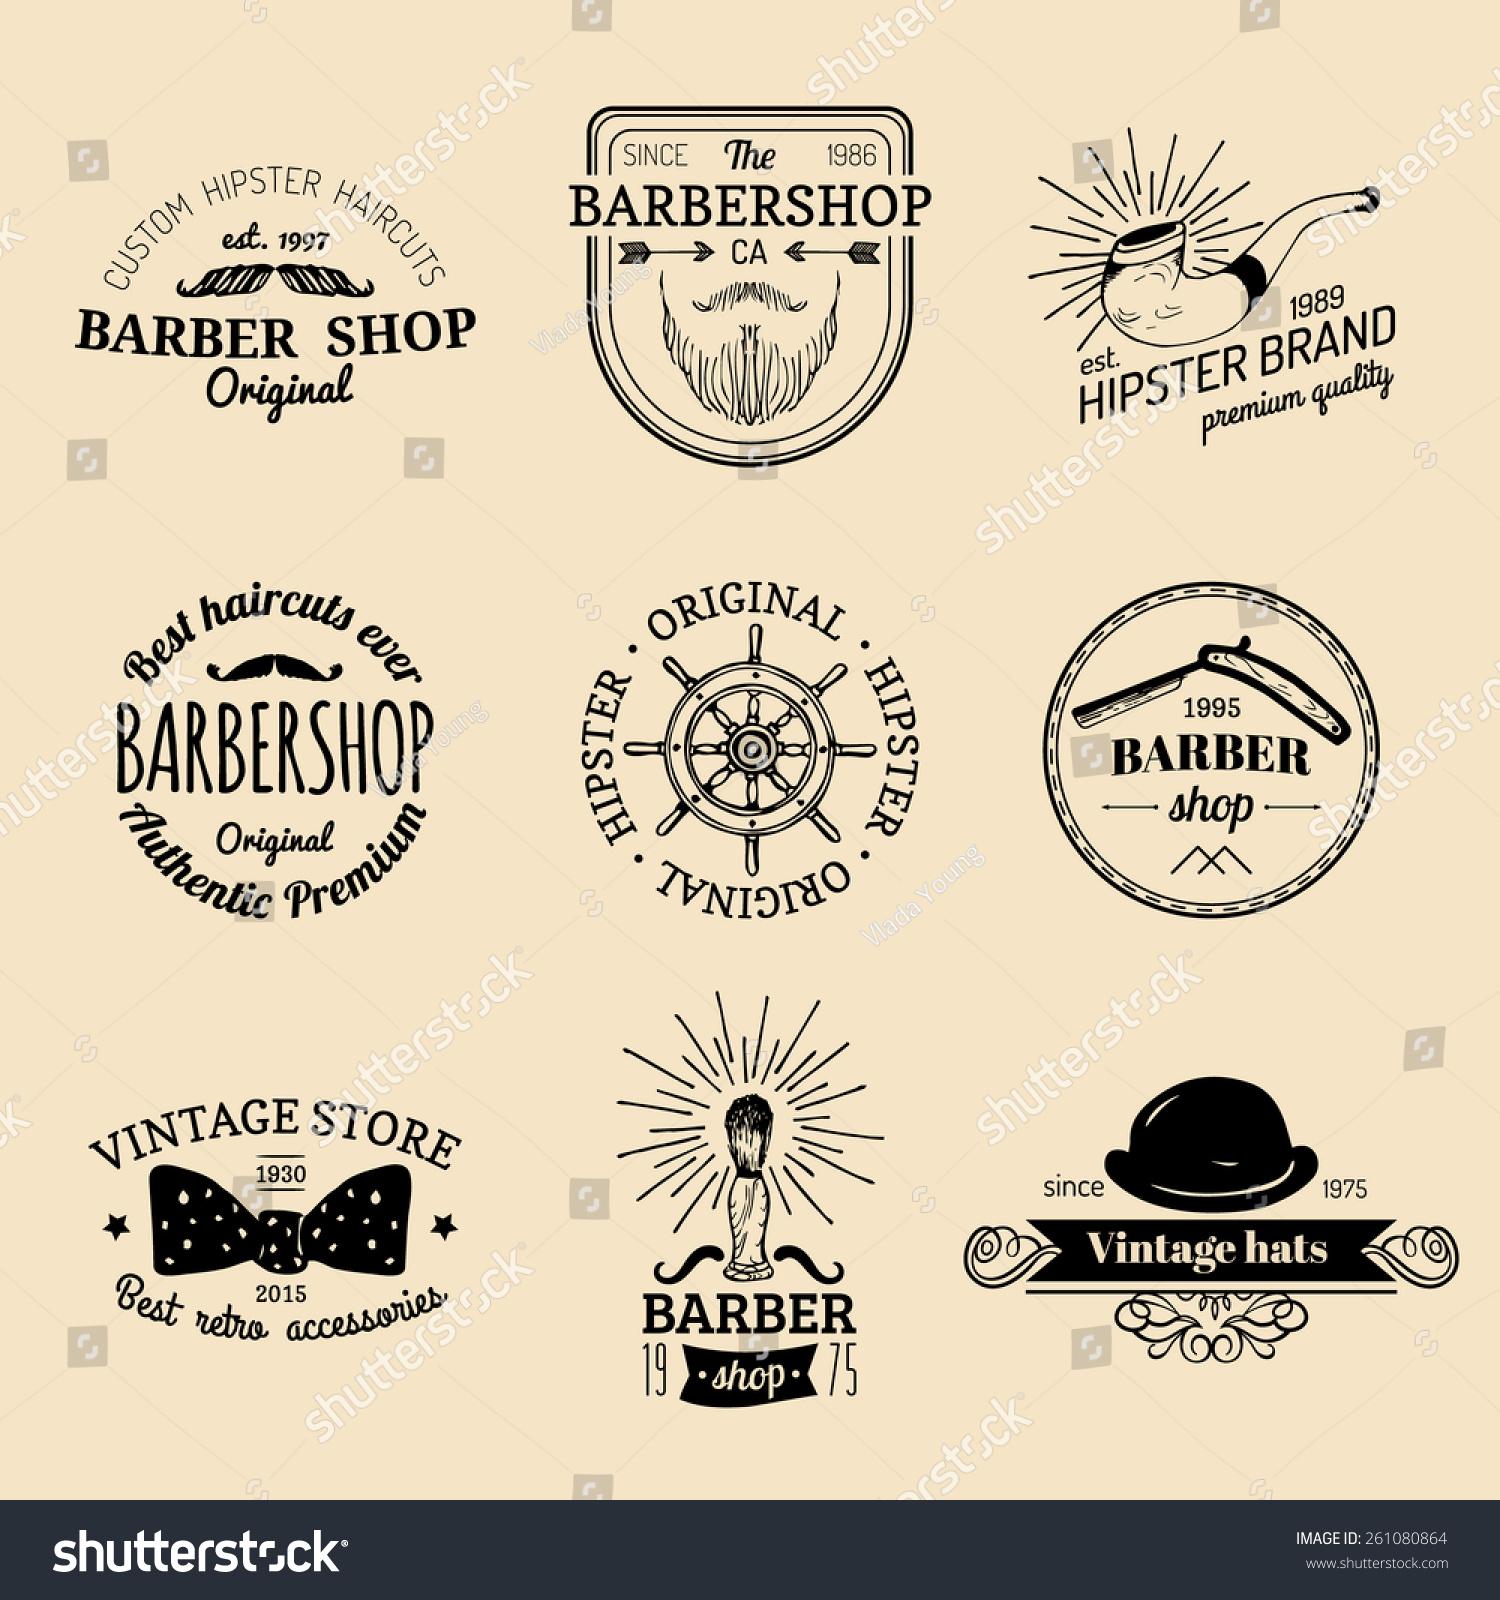 Clip art vector of vintage barber shop logo graphics and icon vector - Vector Set Of Vintage Hipster Logos Retro Icons Collection Of Vintage Barber Shop